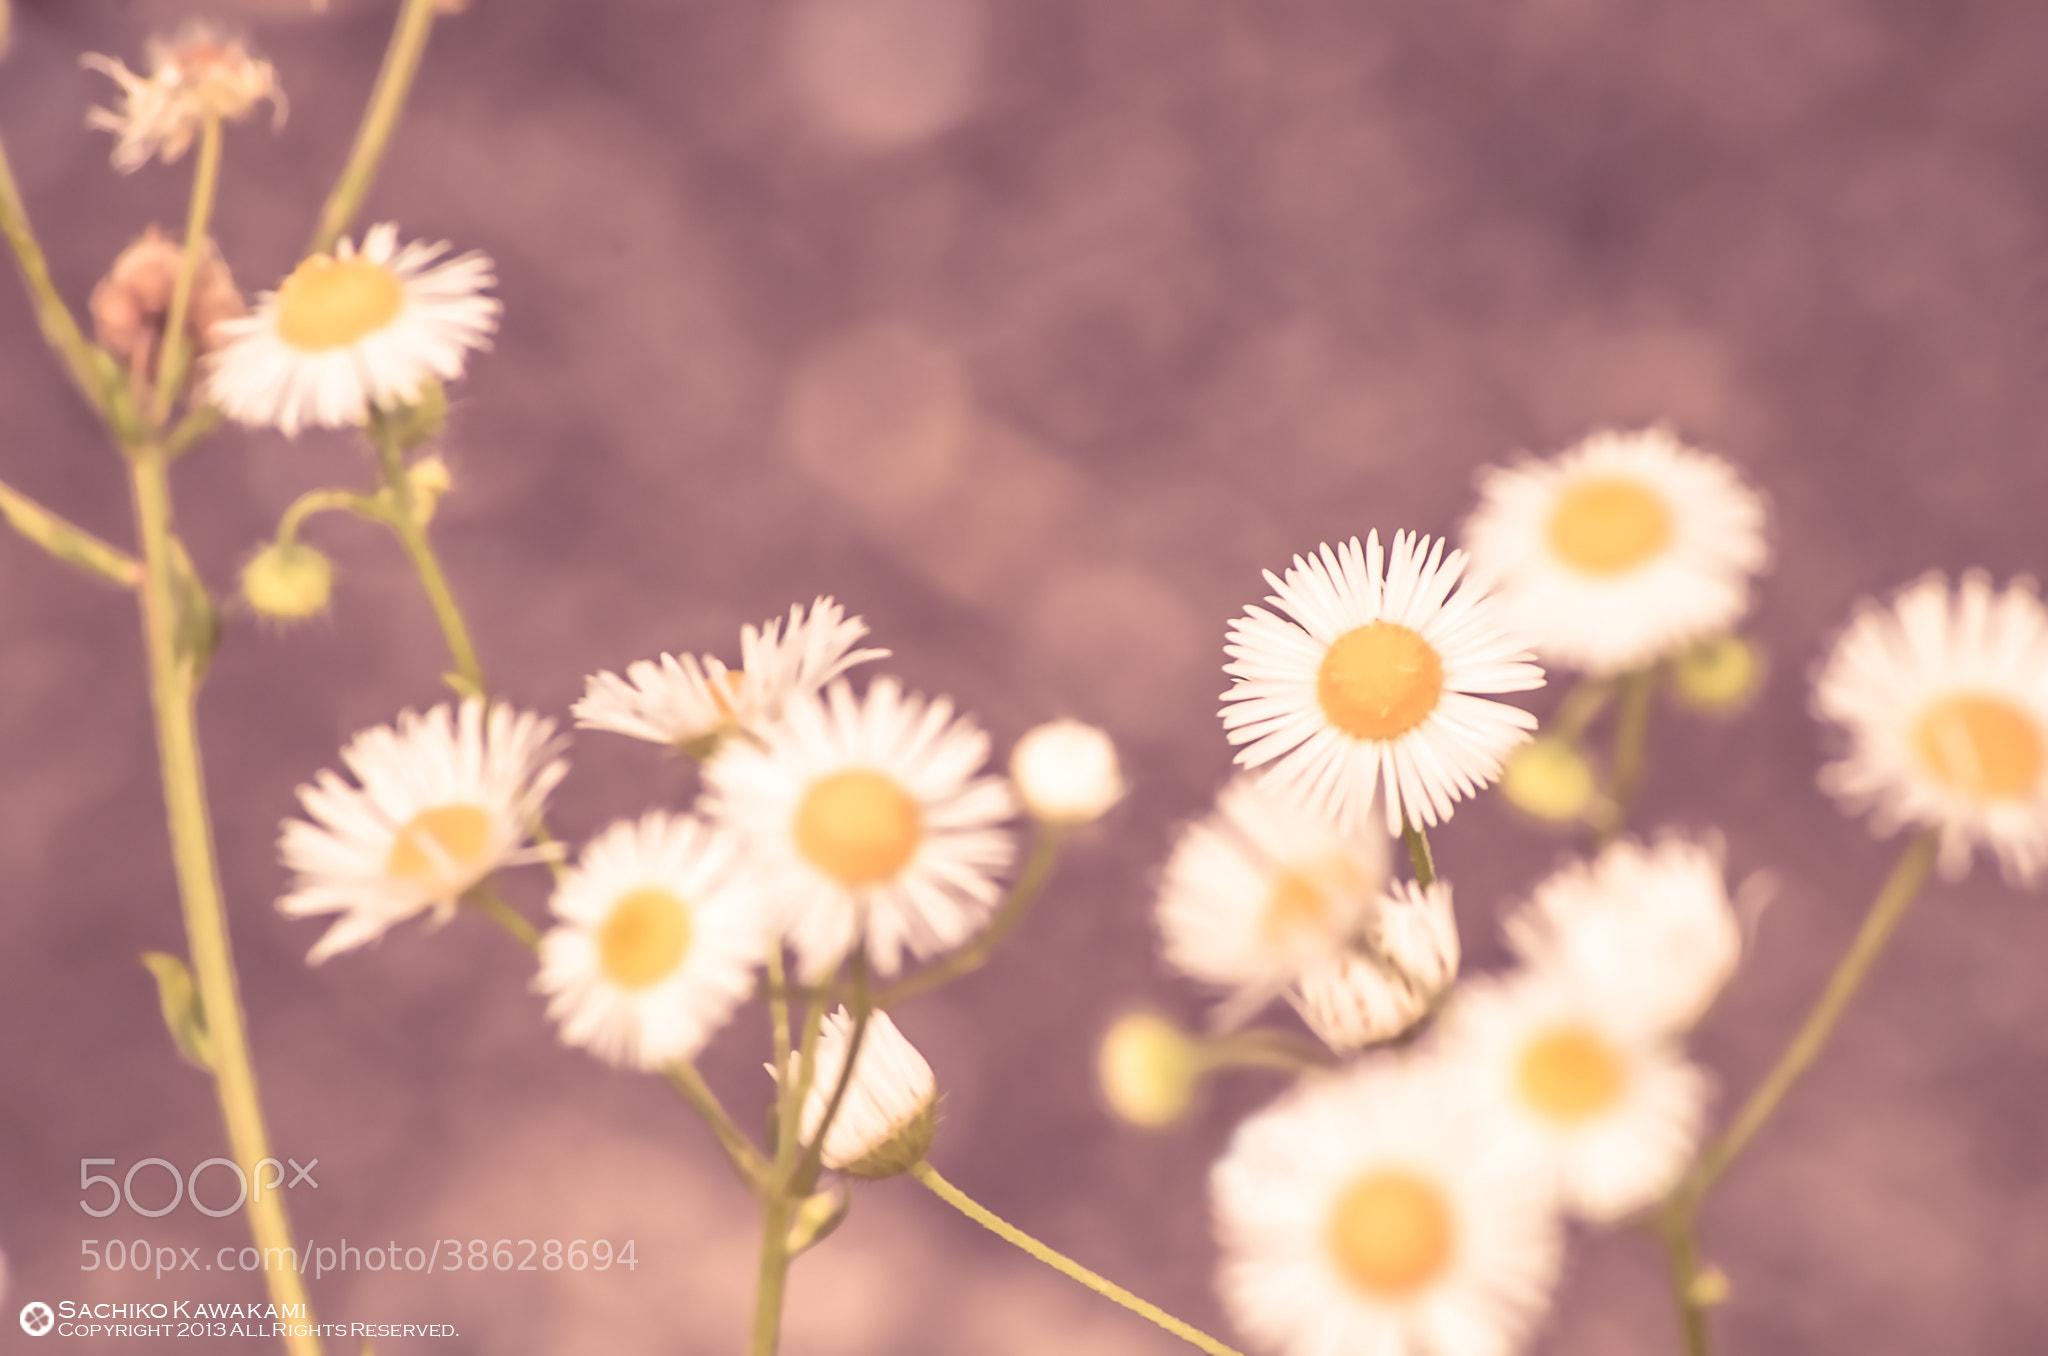 Photograph 風に吹かれて by Sachiko Kawakami on 500px